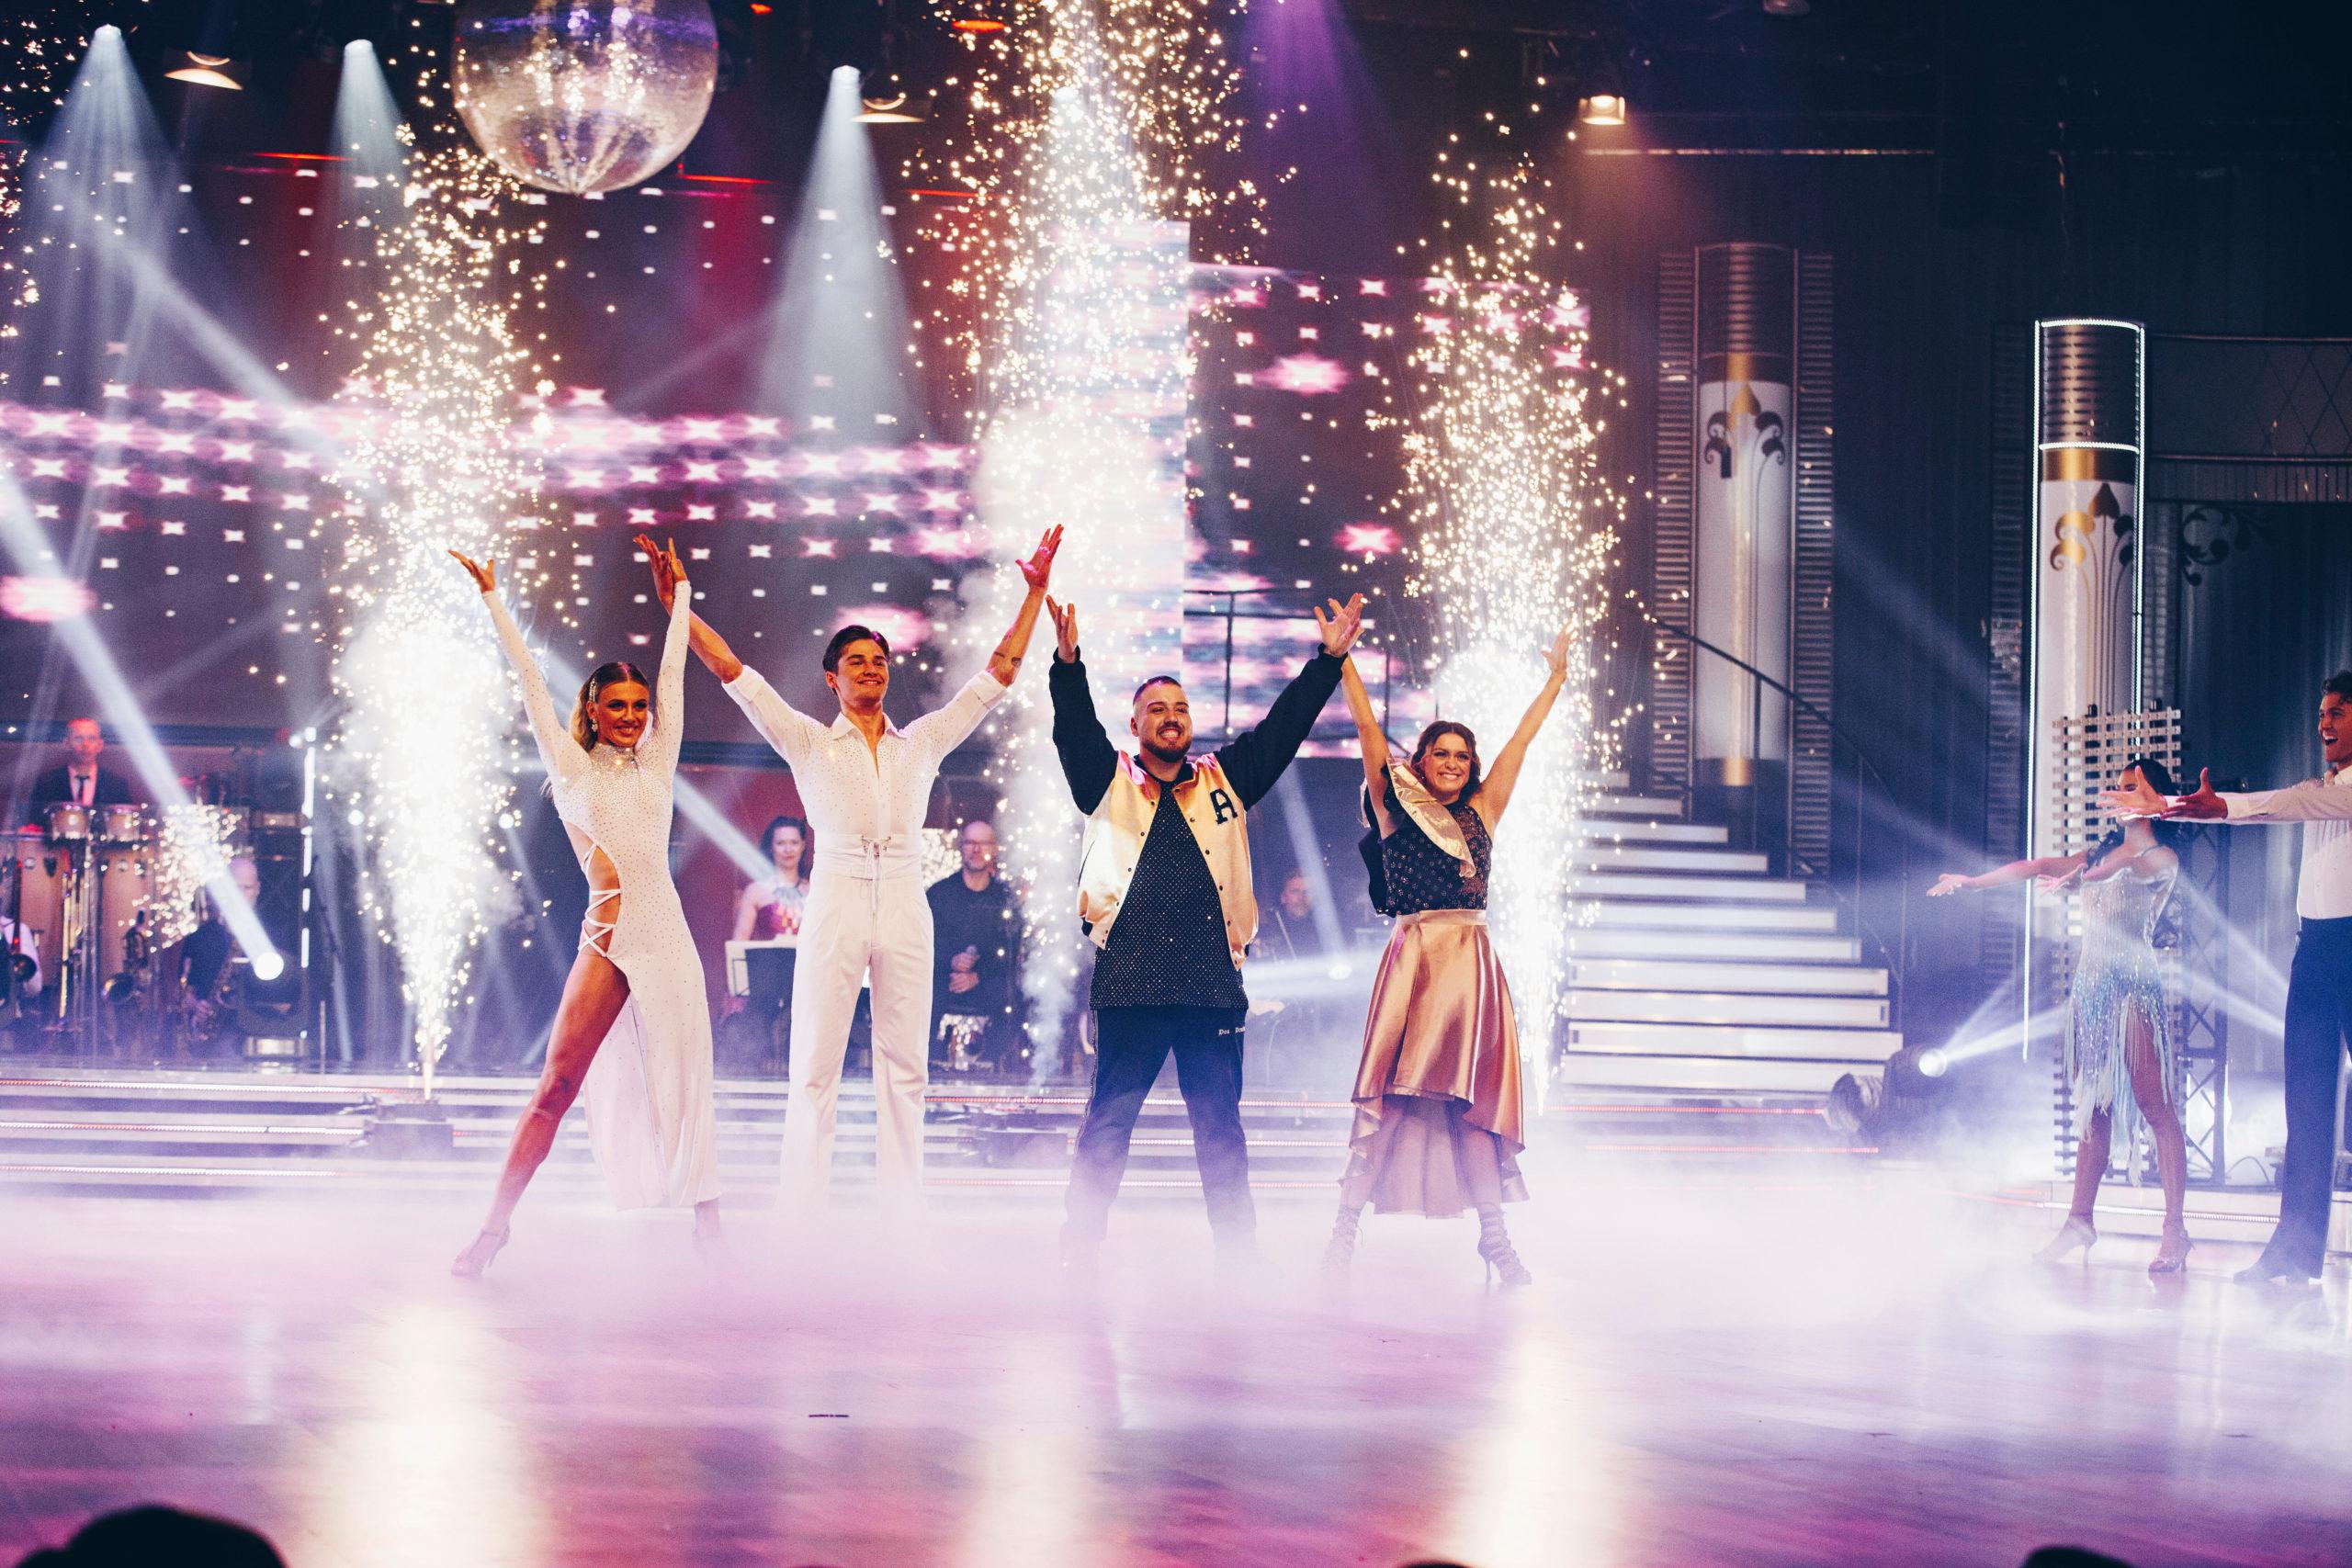 Filip Lamprecht vann Let's dance